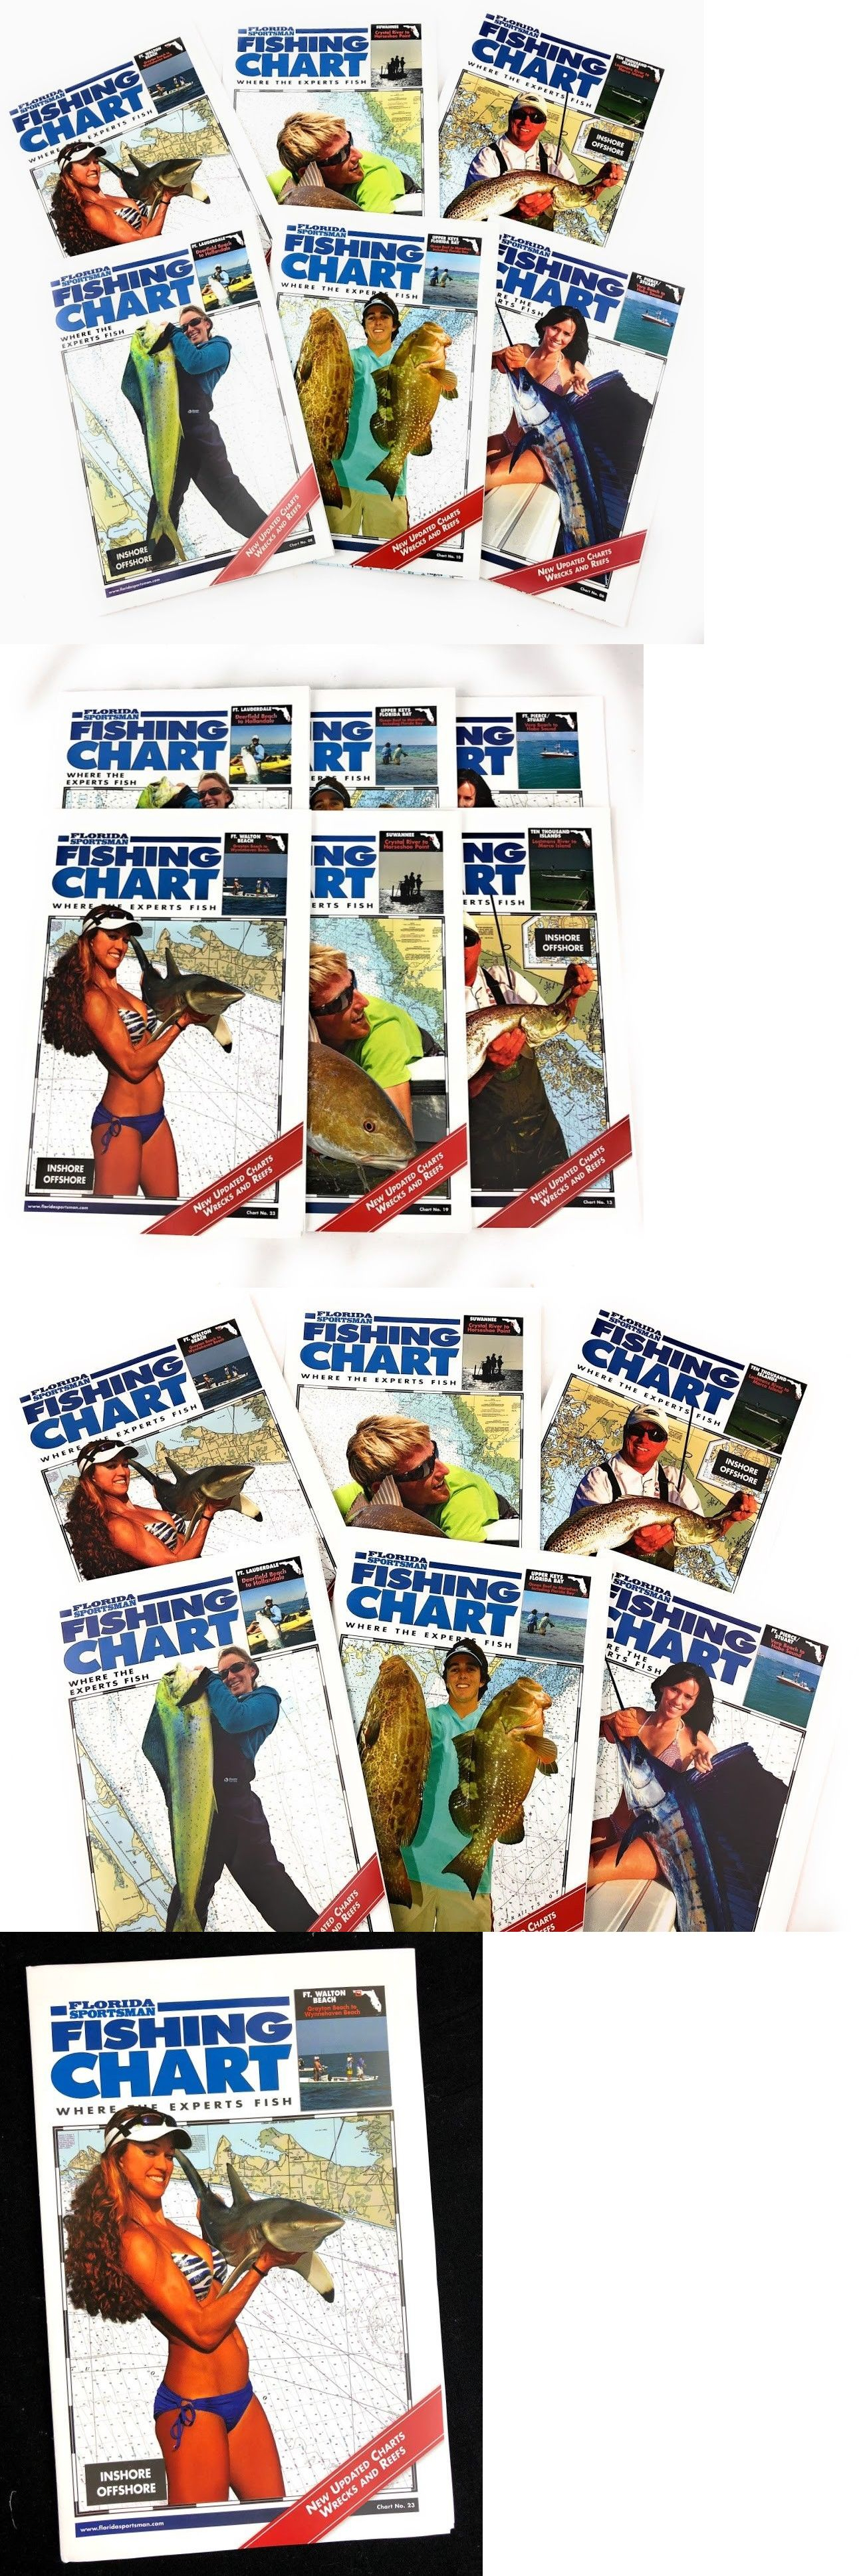 Charts And Maps 179987: Florida Sportsman Fishing Chart Inshore - Florida Sportsman Fishing Maps